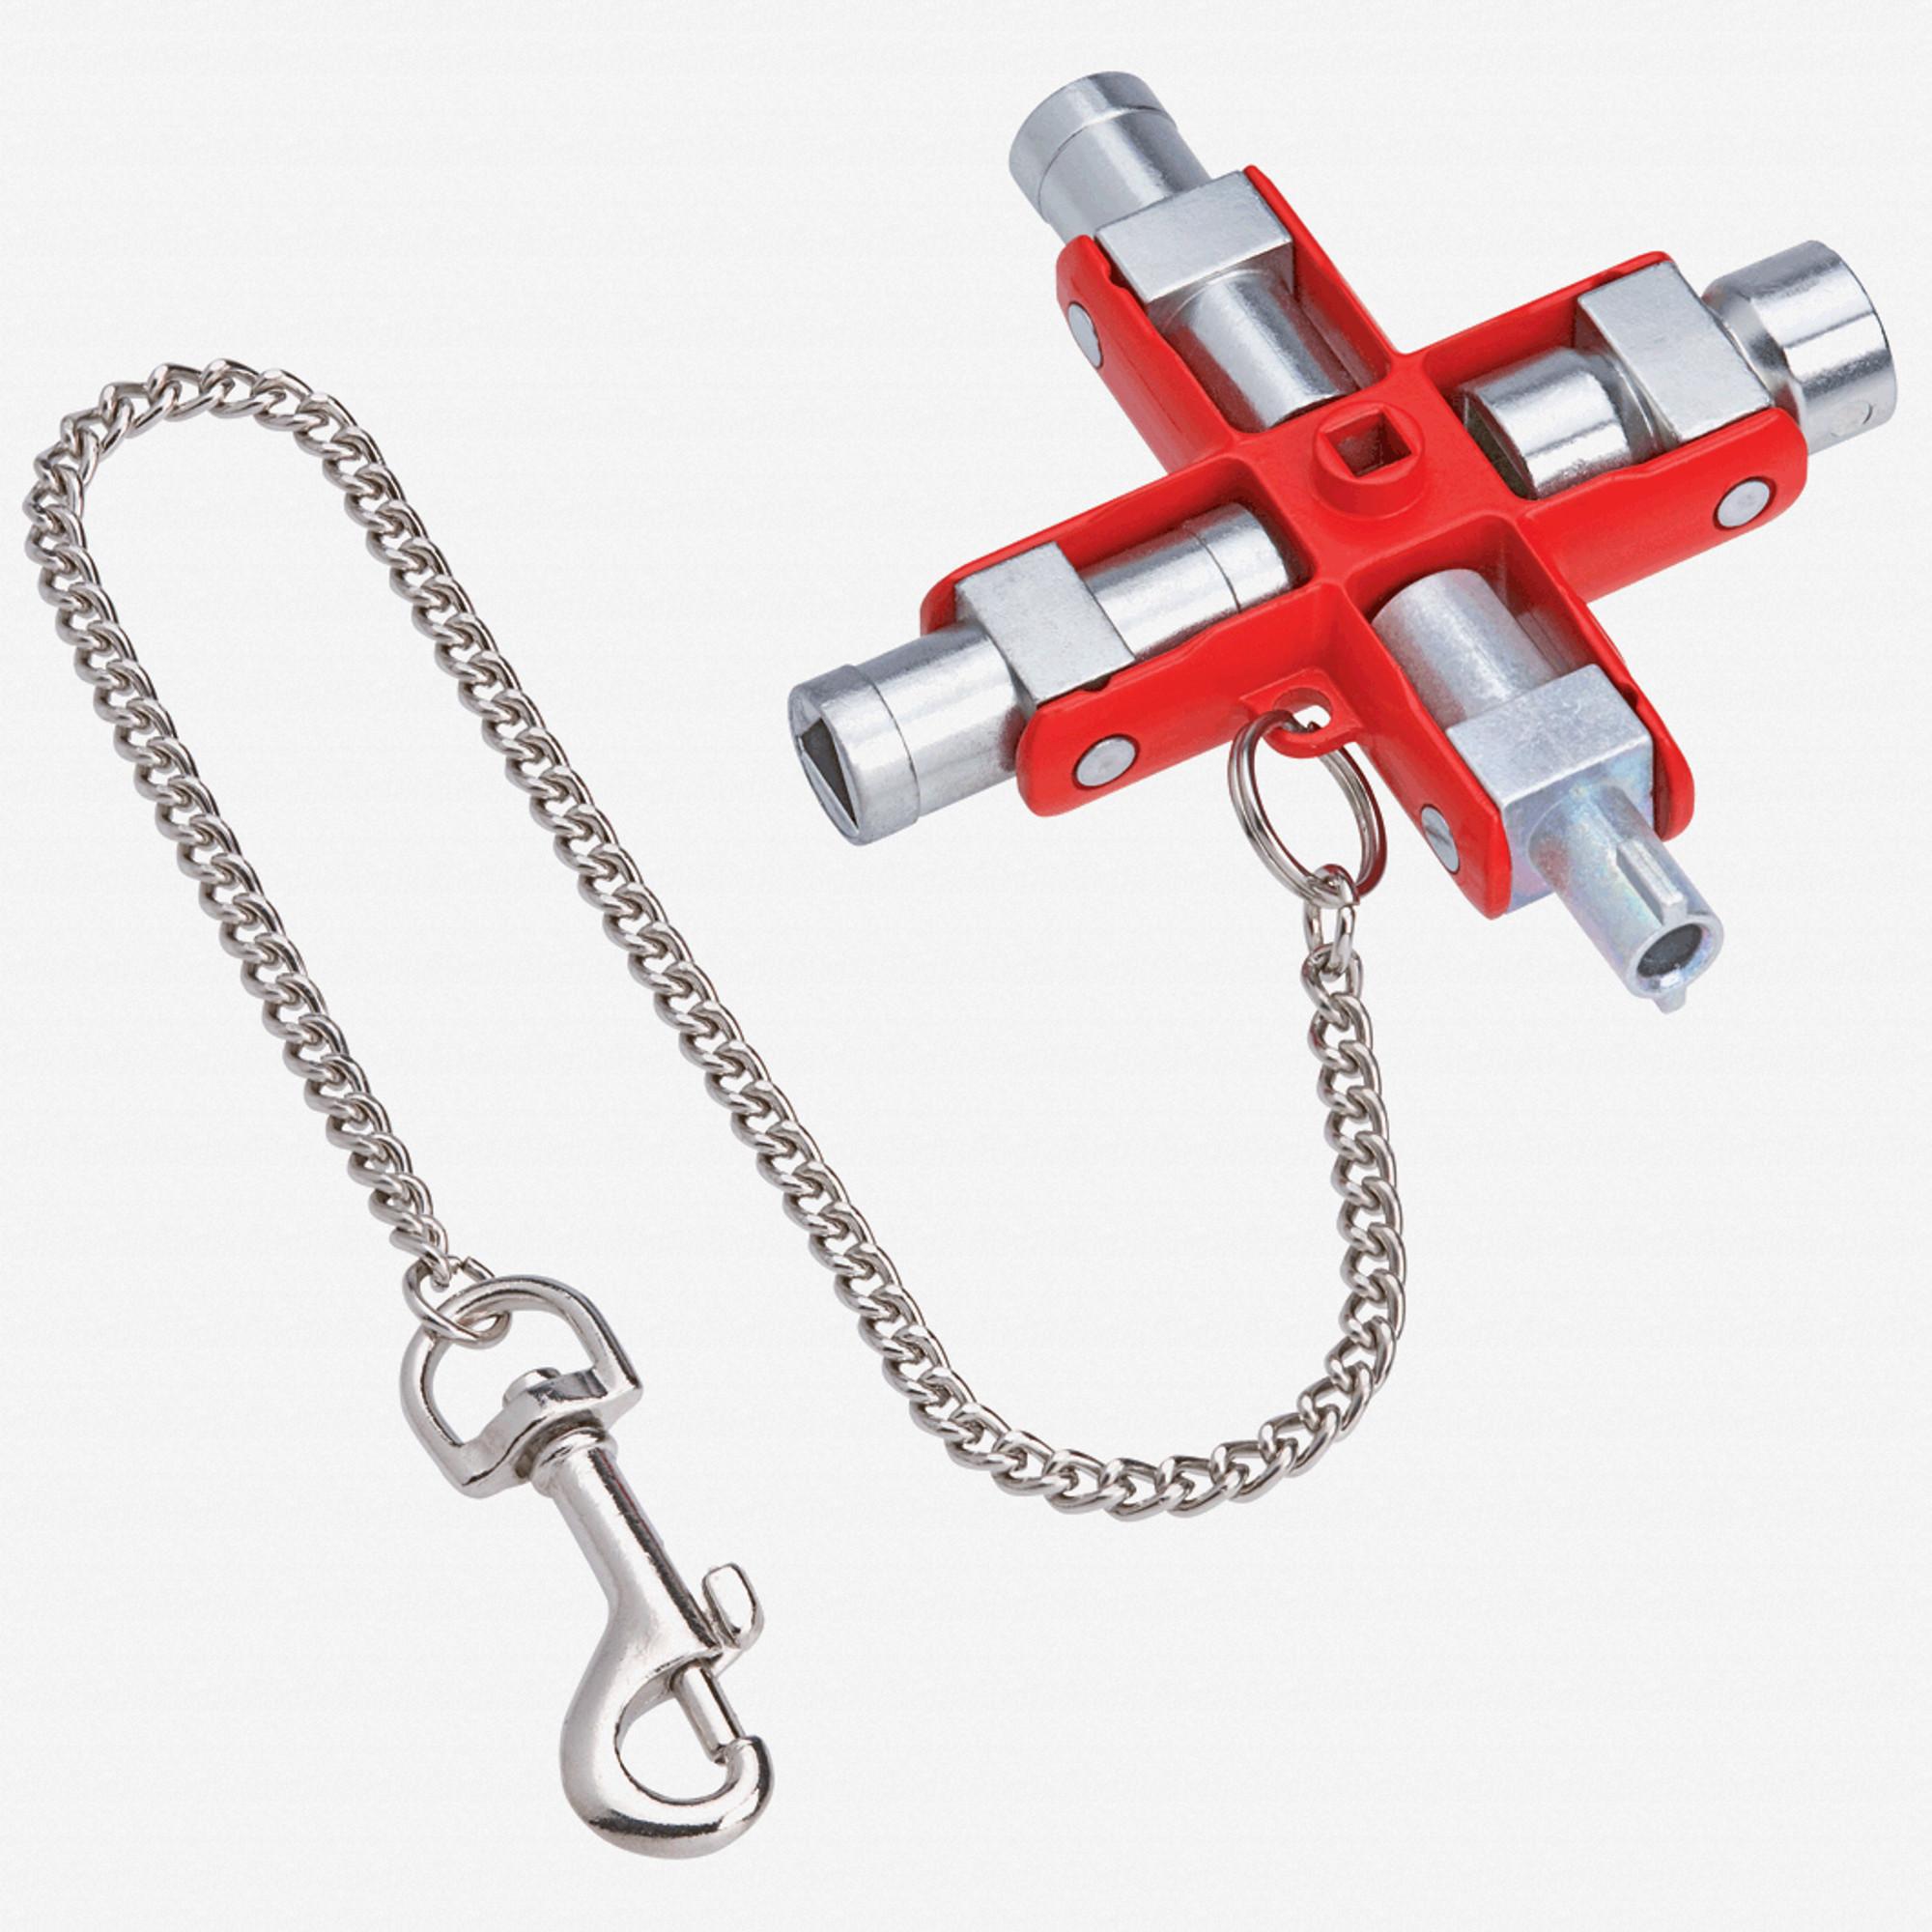 KNIPEX Universal Key 00 11 06 90 mm